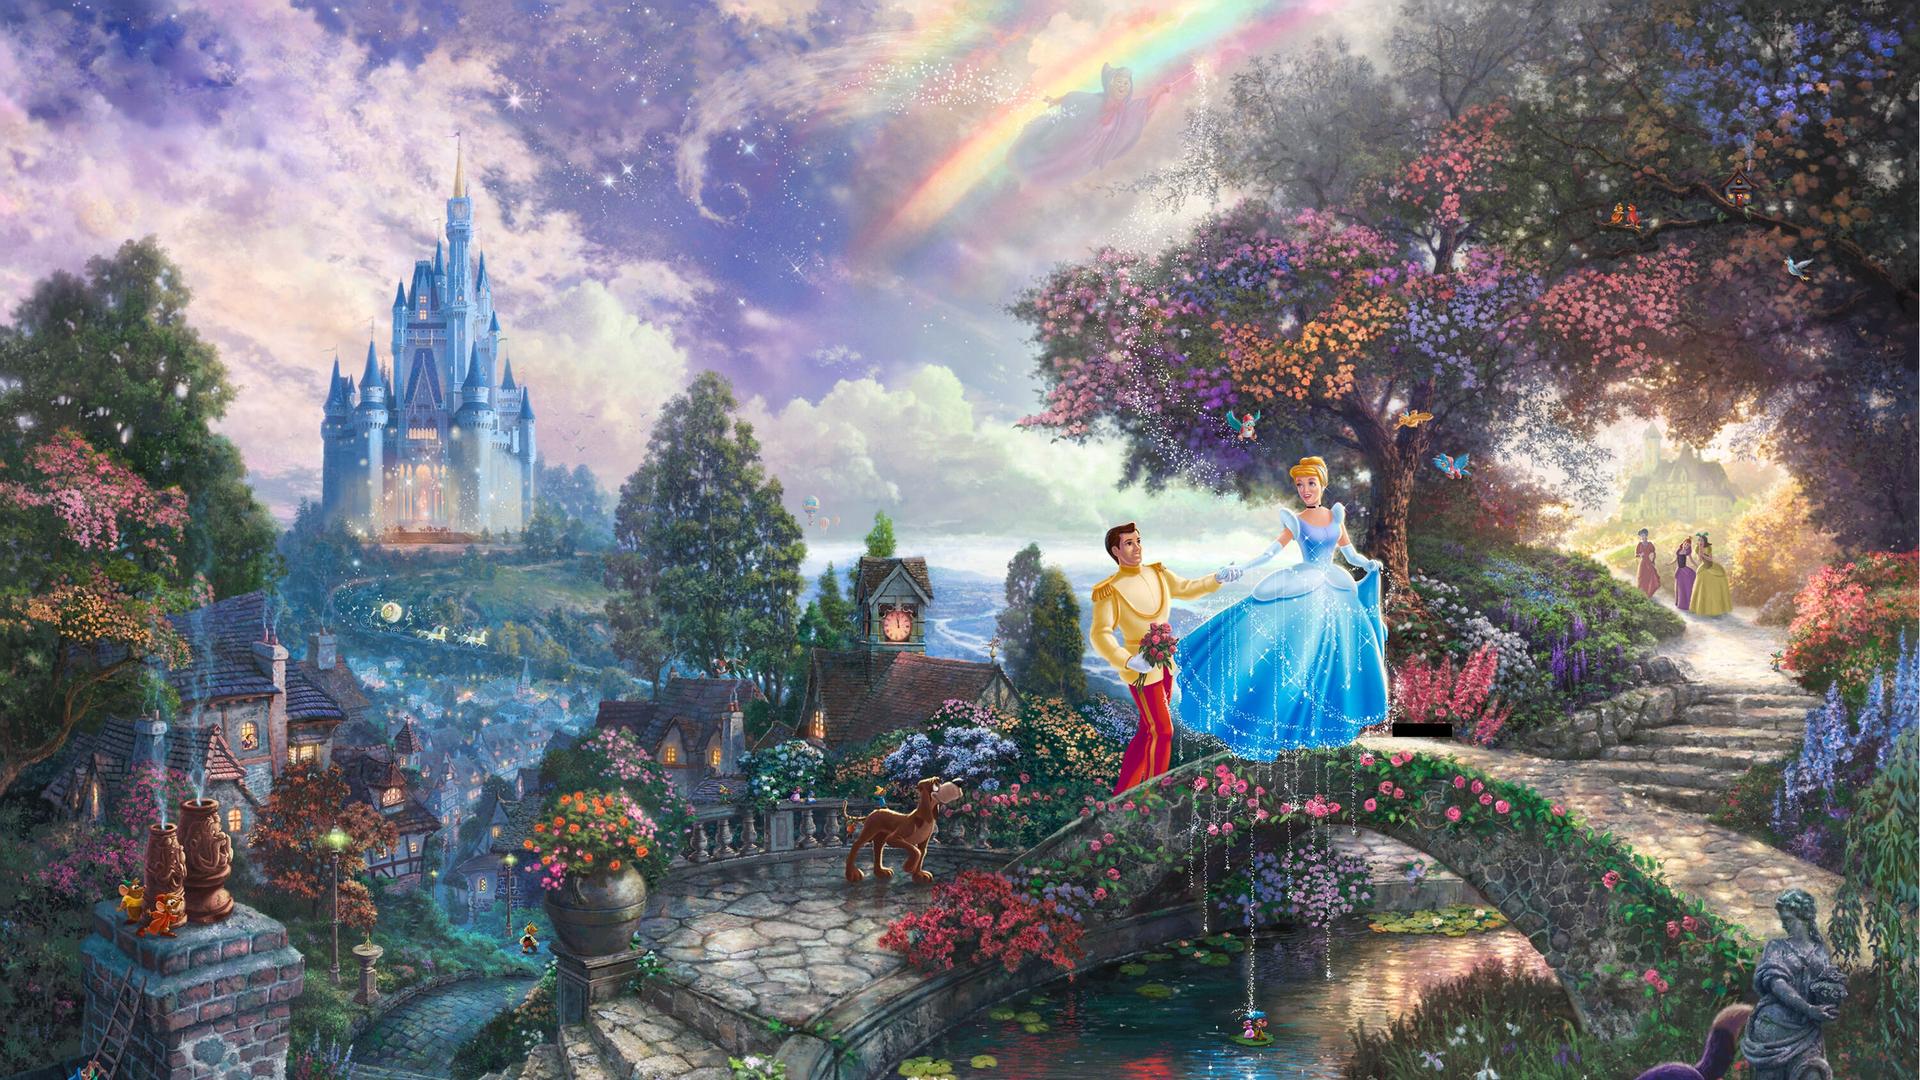 Thomas Kinkade Wallpaper painting Cinderella prince Disney castle 1920x1080